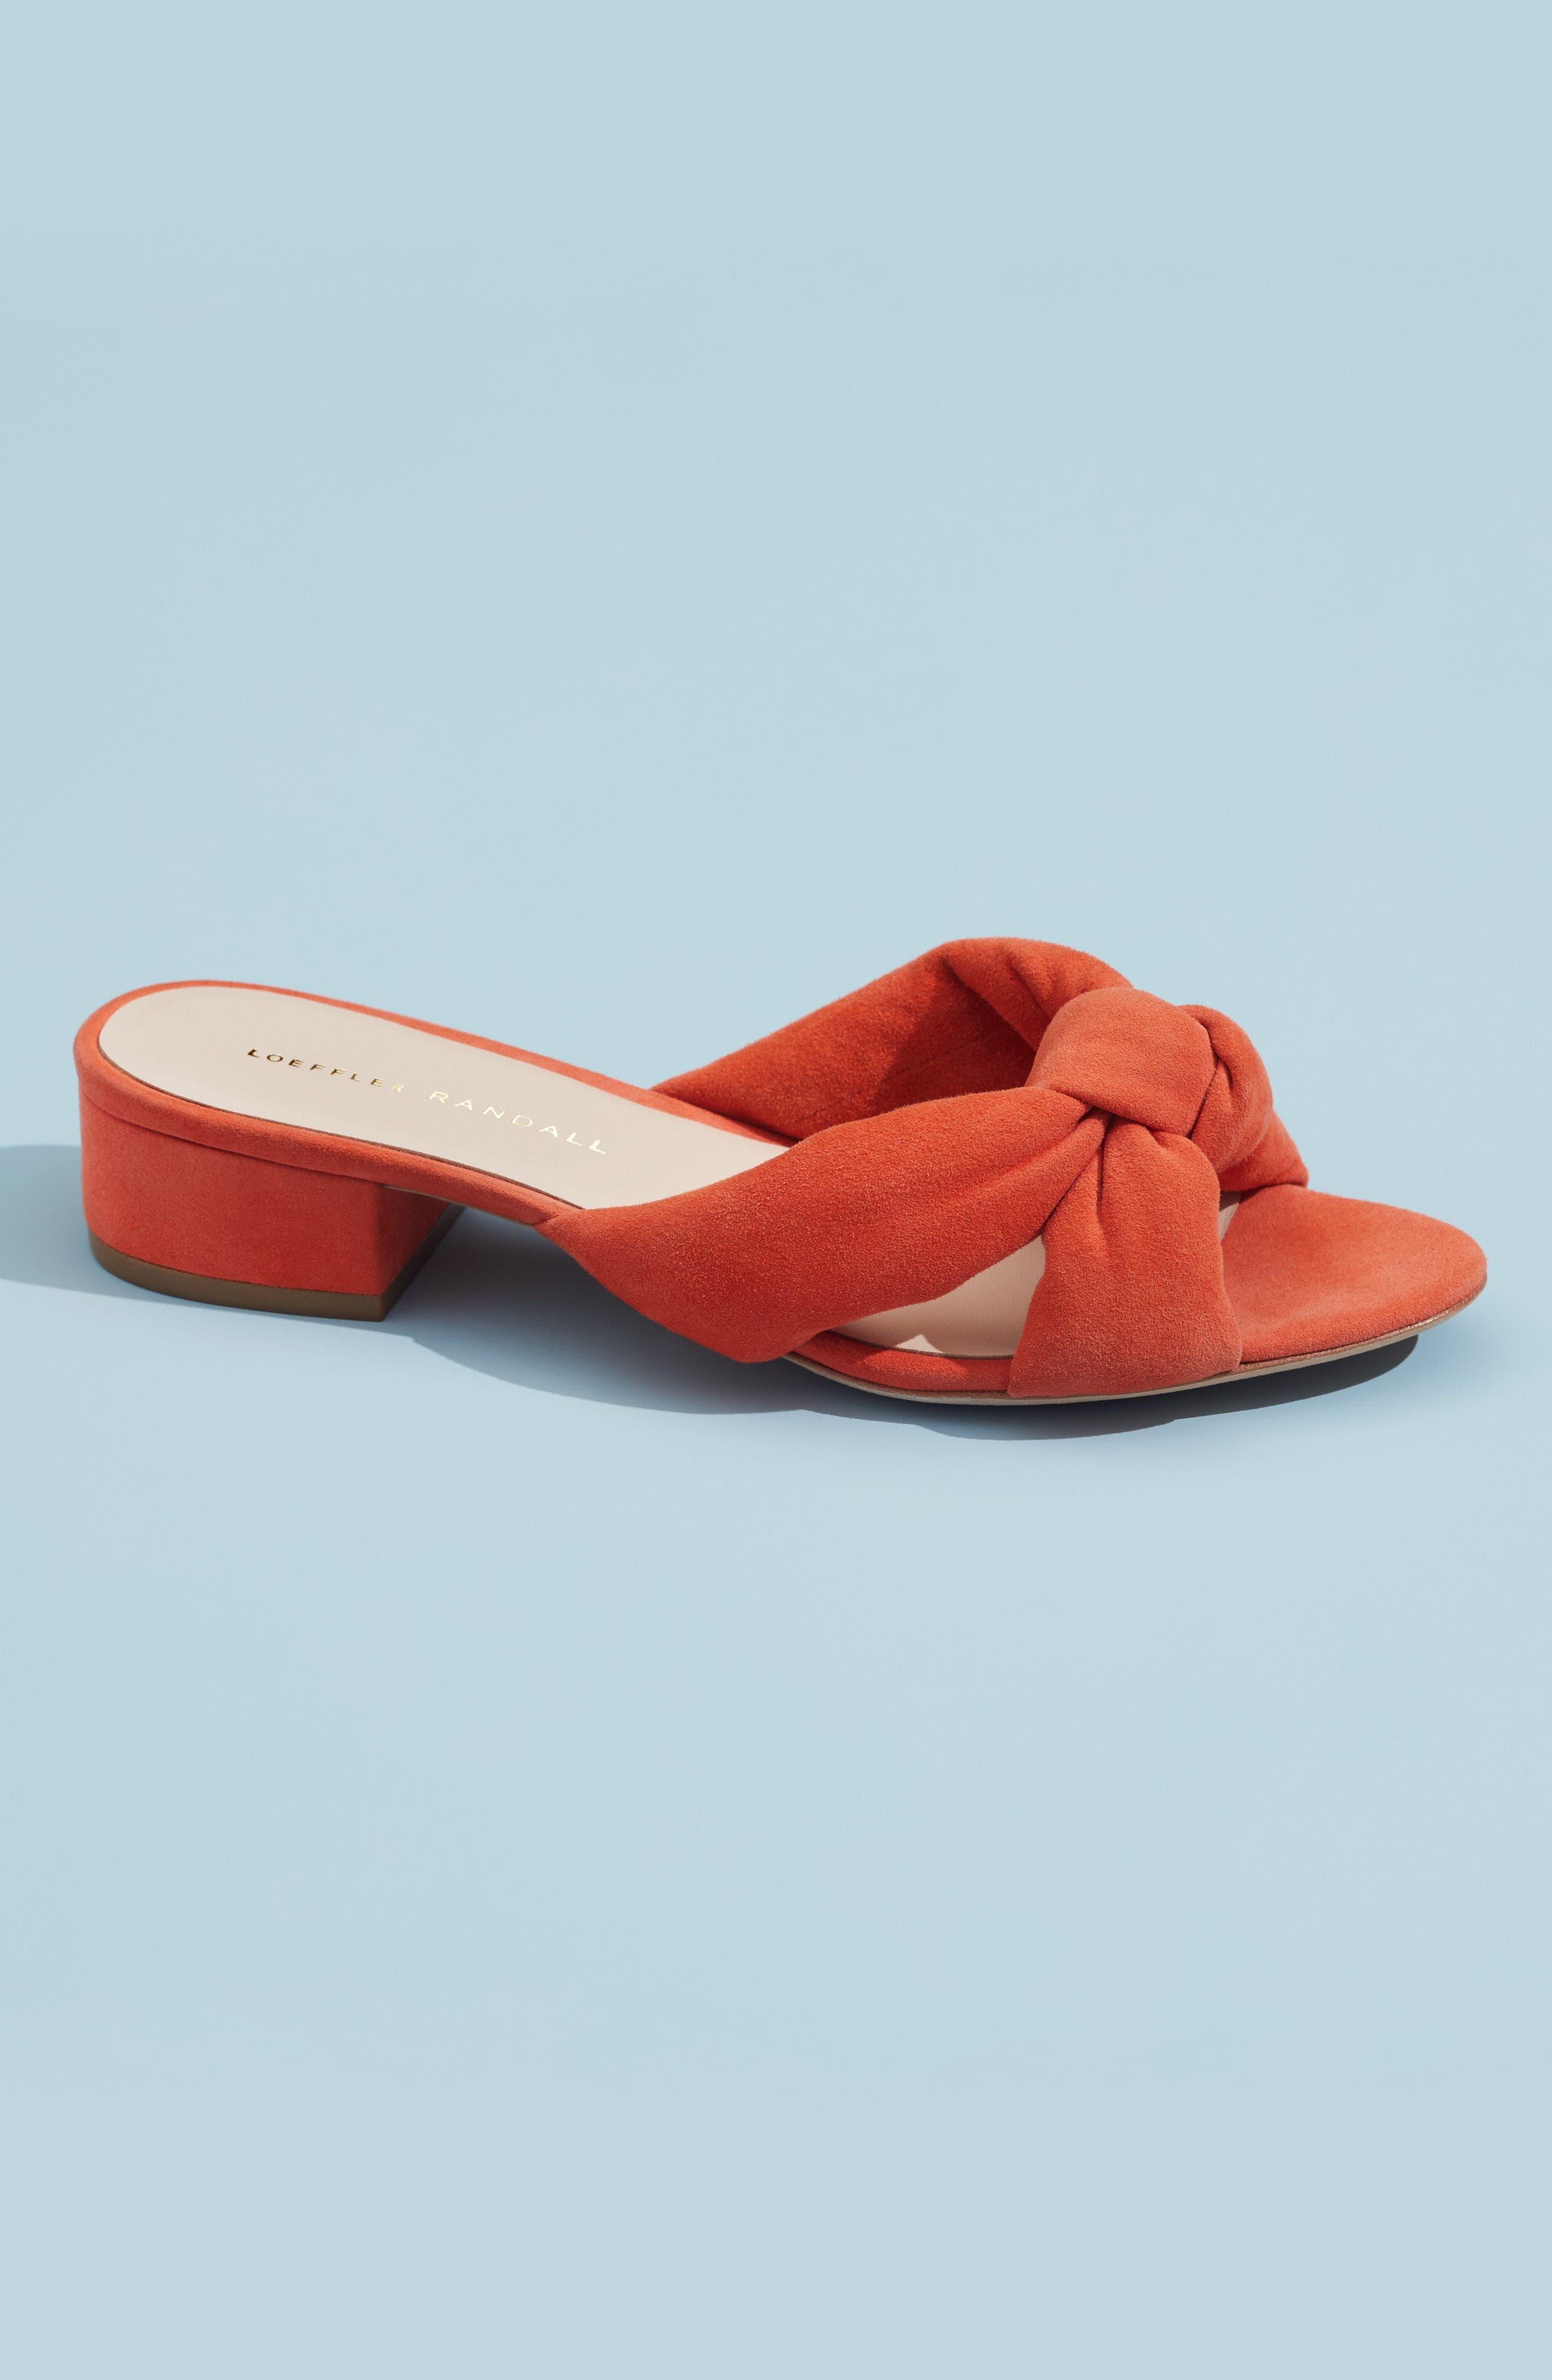 Elsie Knotted Slide Sandal,                             Alternate thumbnail 7, color,                             040